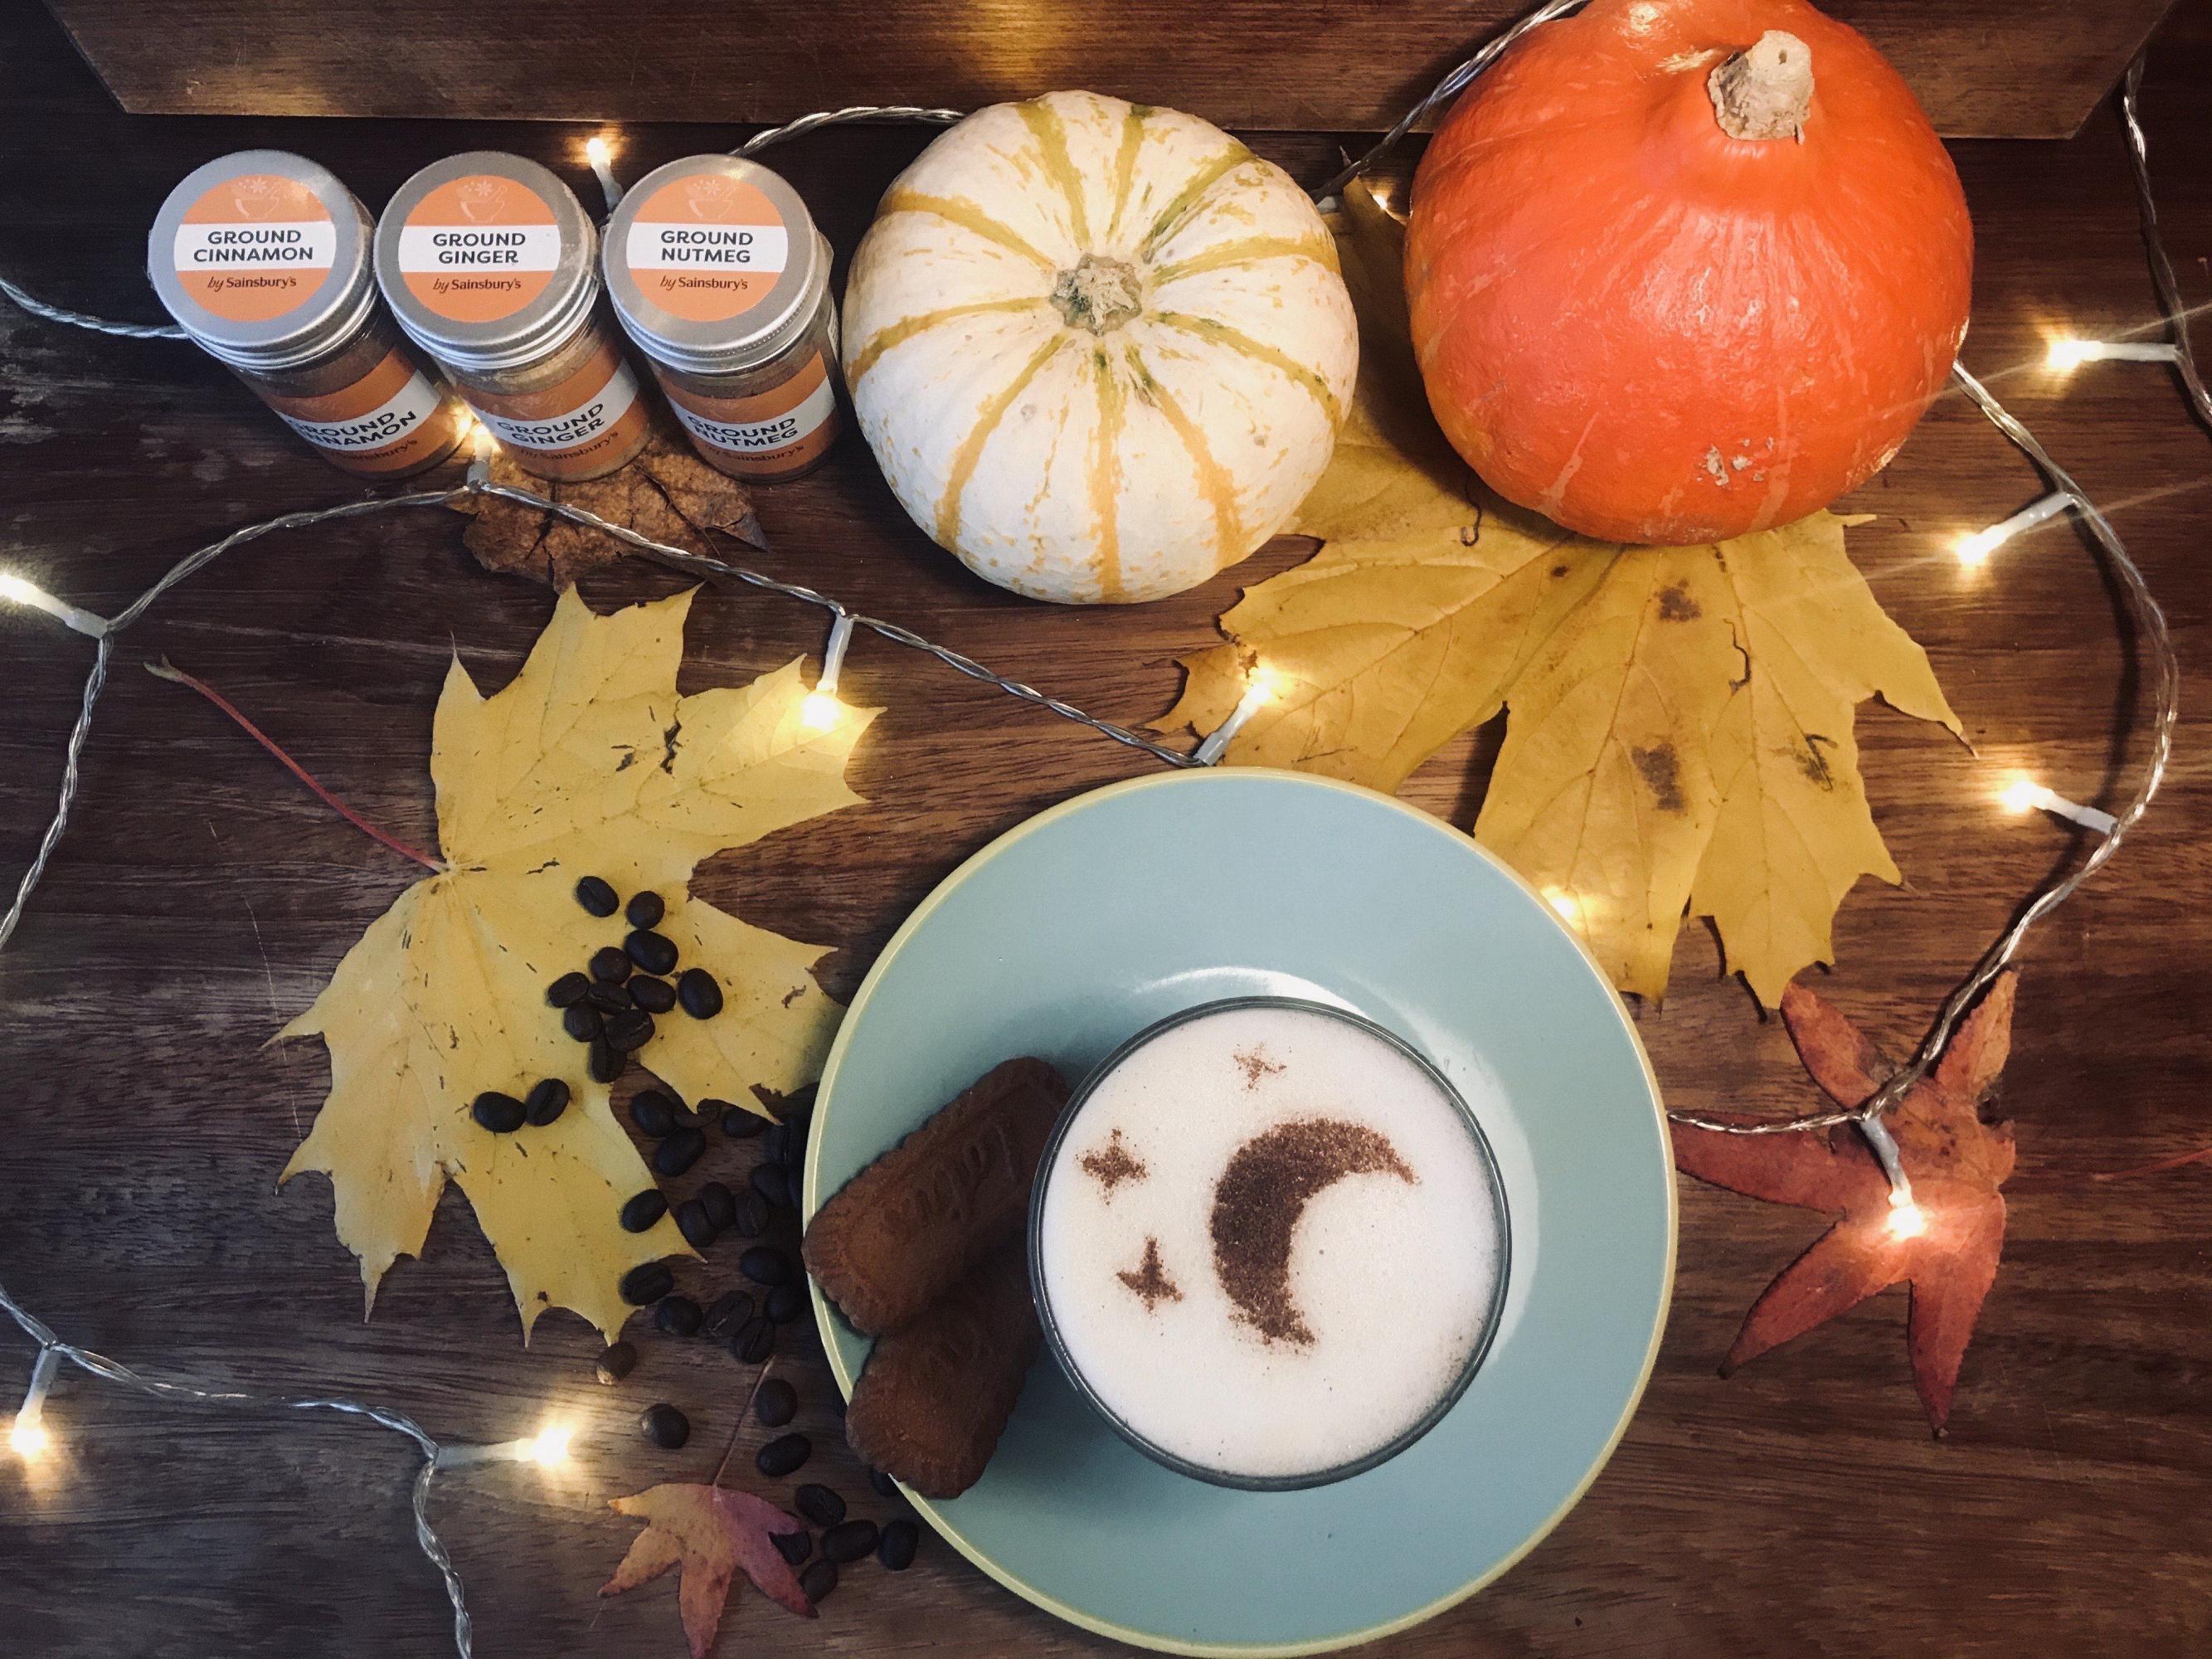 Masala's Halloween inspired Pumpkin Spiced Latte Recipe